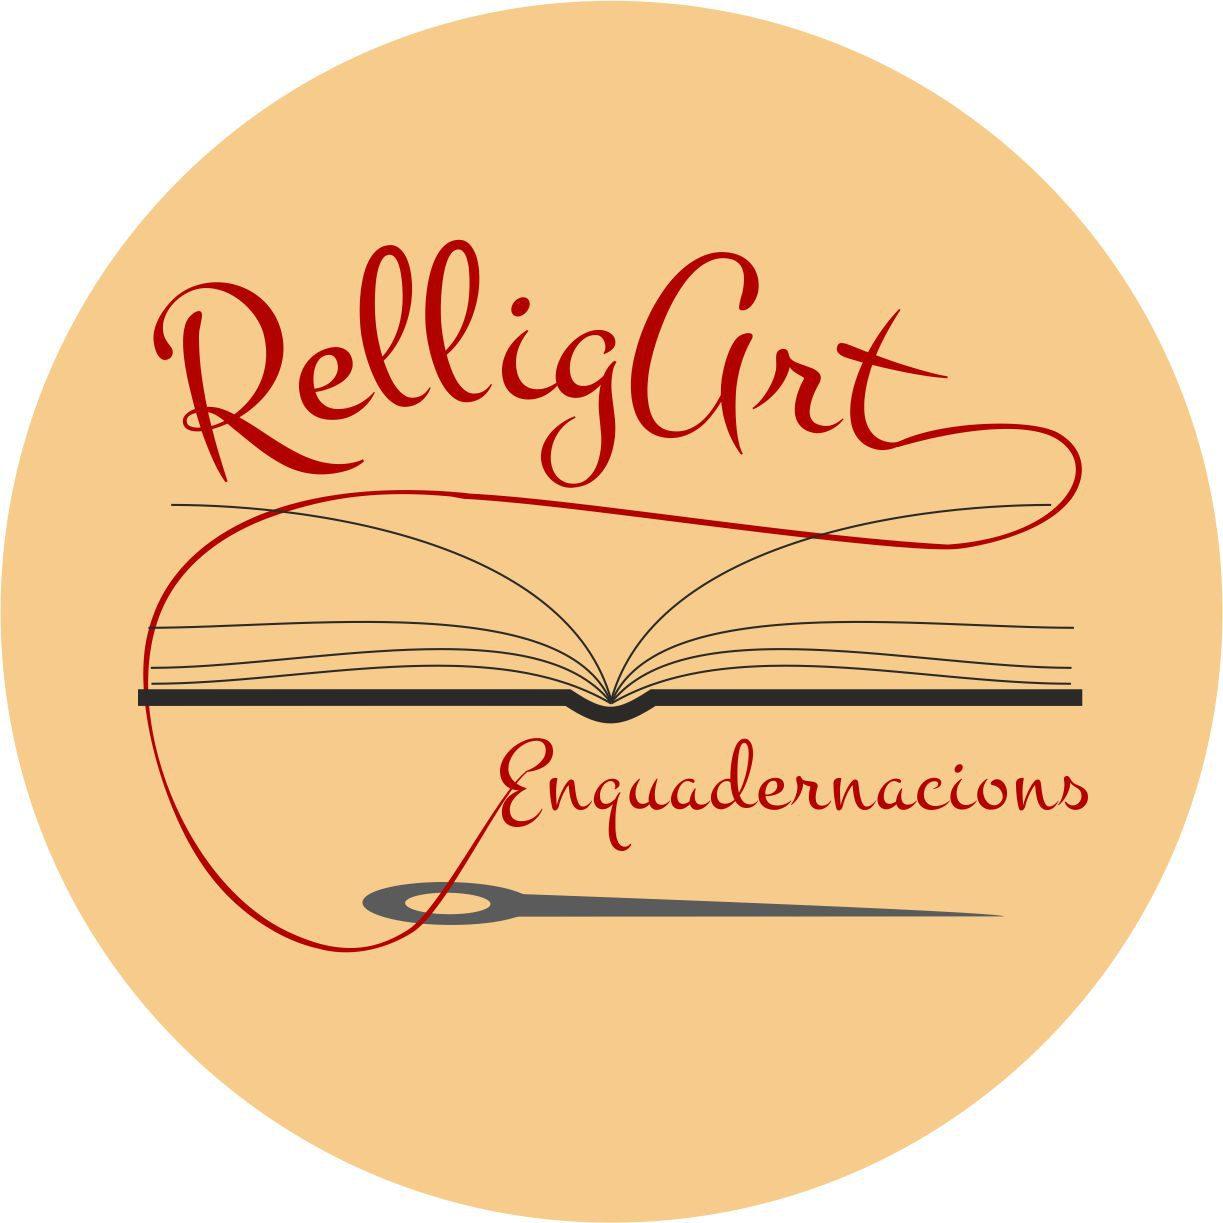 RelligArt